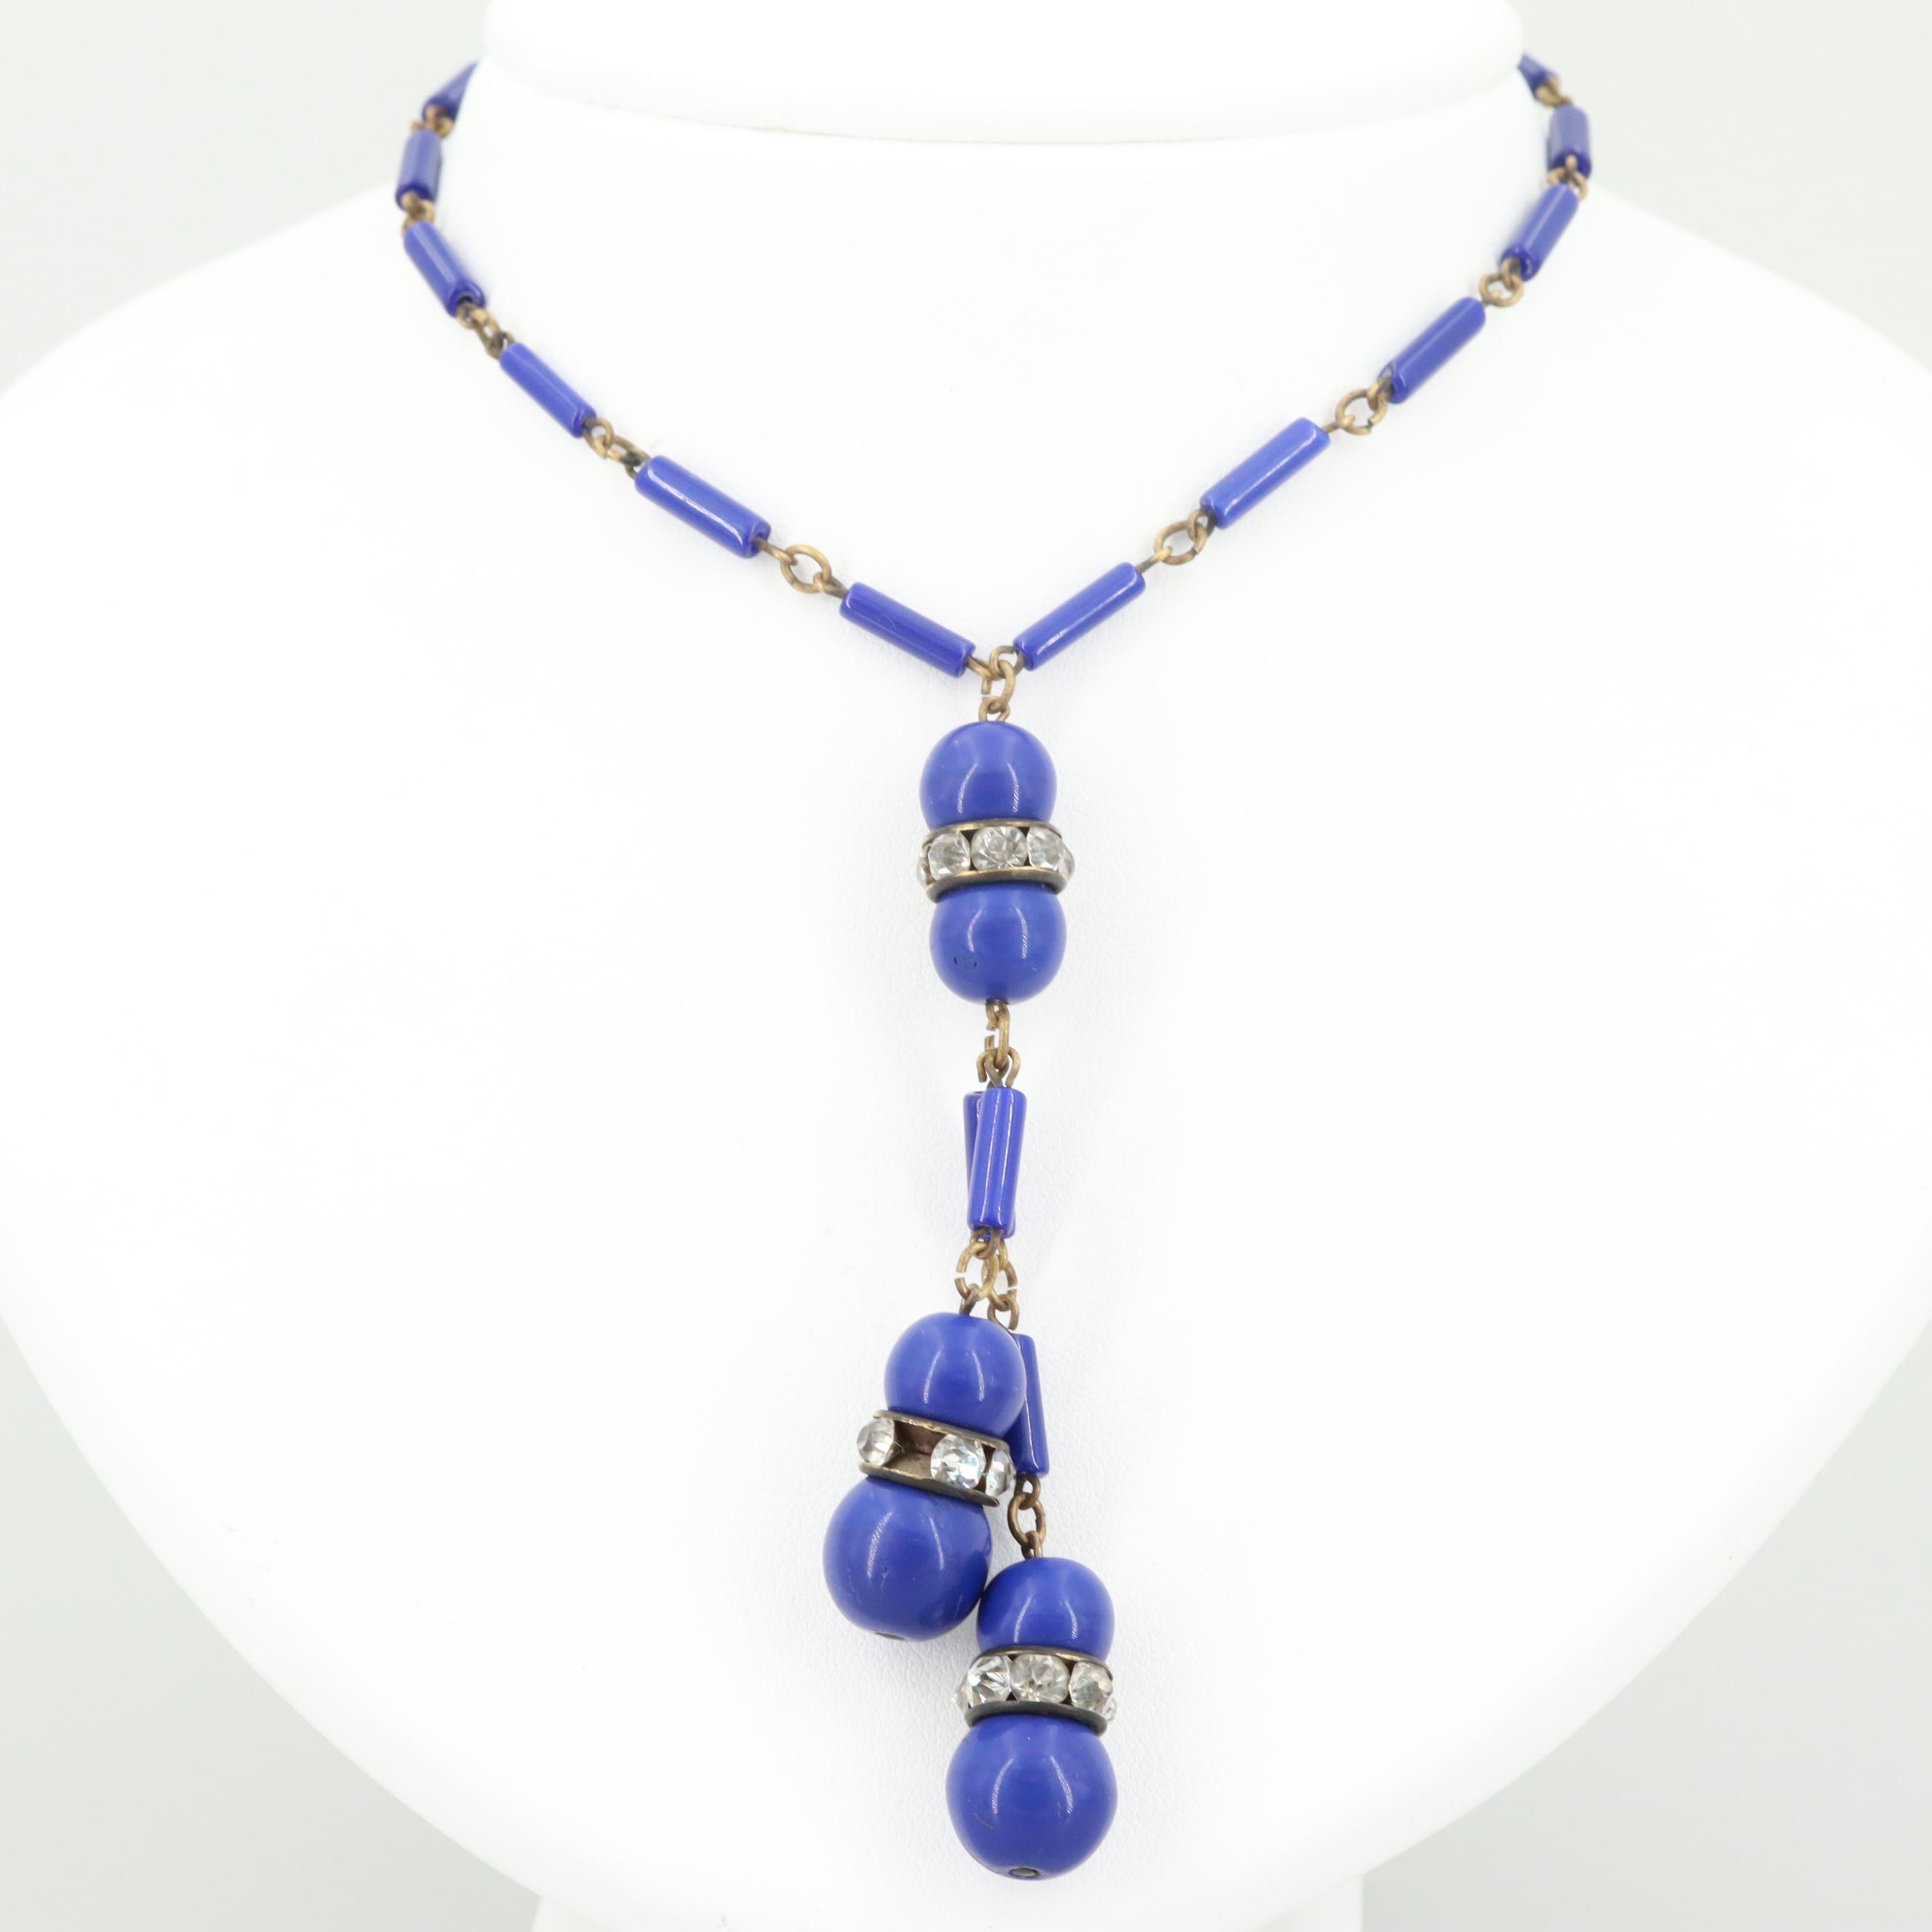 Art Deco Gold Tone Imitation Lapis Lazuli and Glass Sautoir Necklace